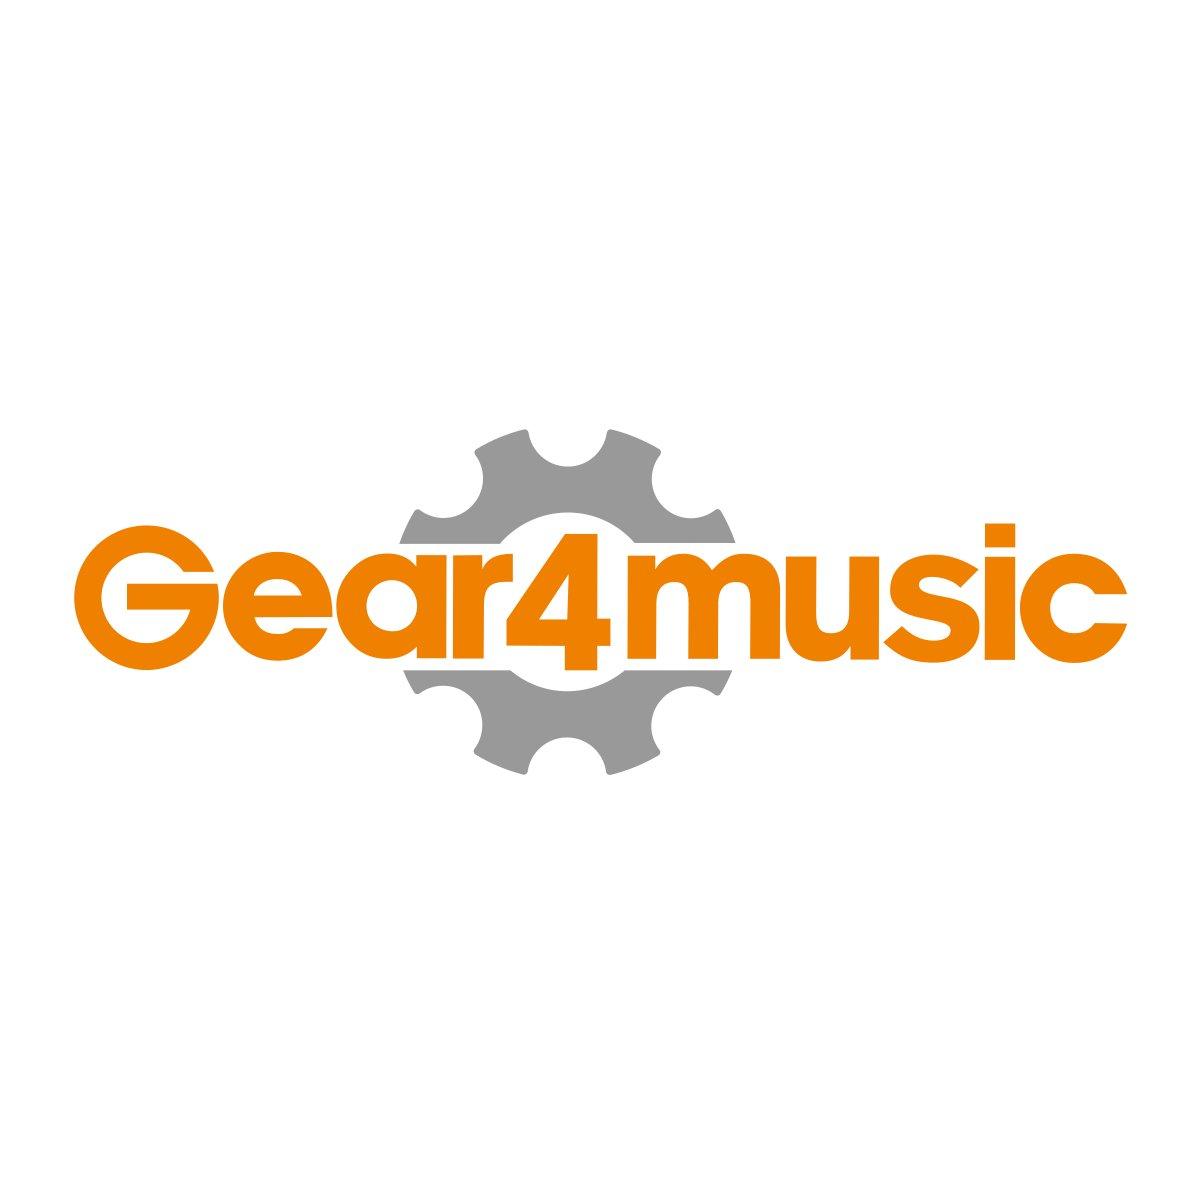 DP-8 Digital Piano by Gear4music